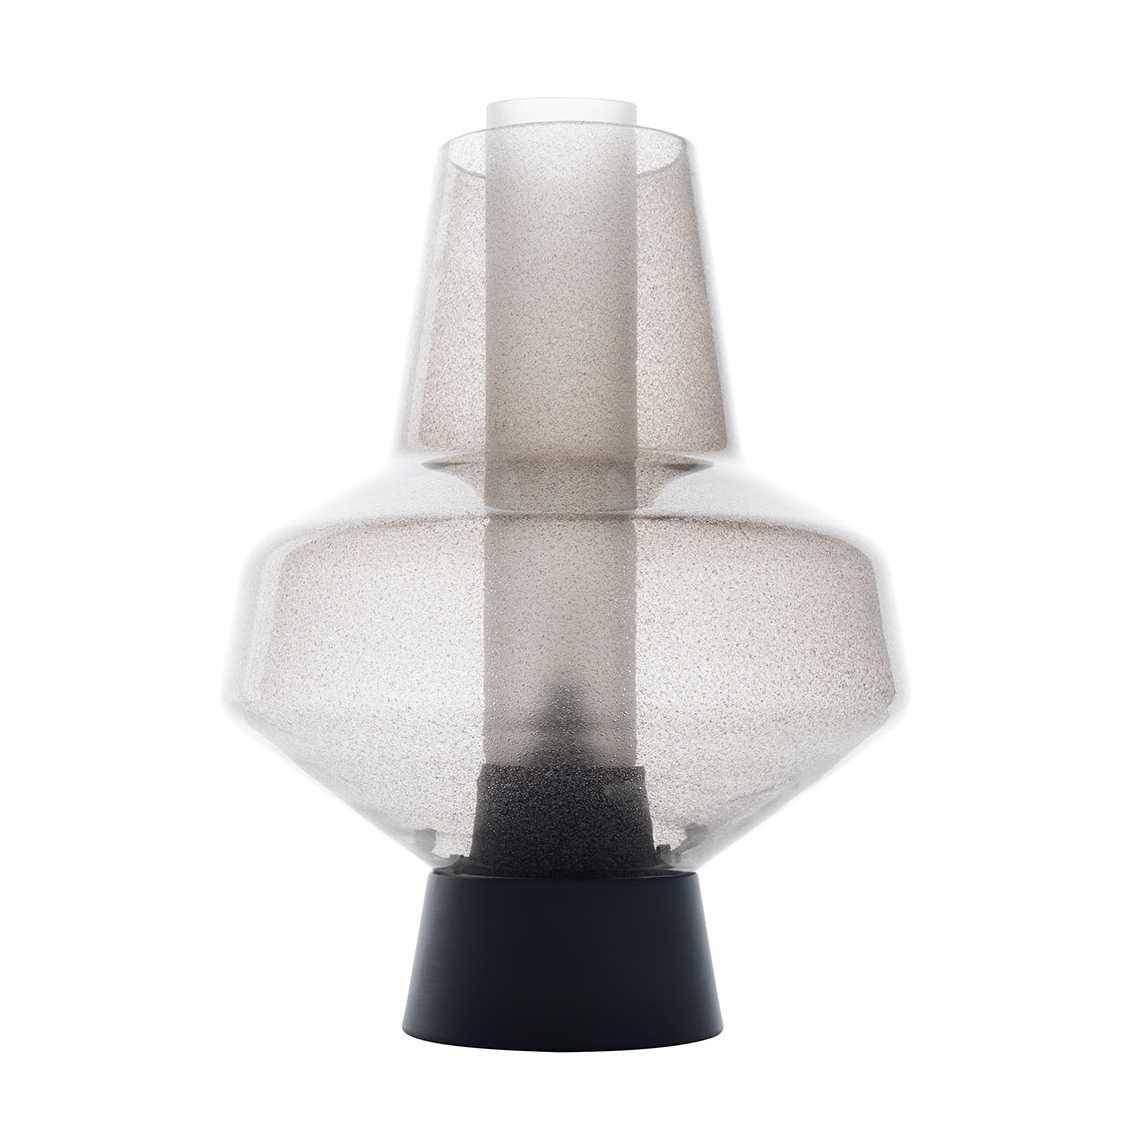 Diesel with Foscarini Metal glass tafellamp Grijs nr. 2Woonkamer